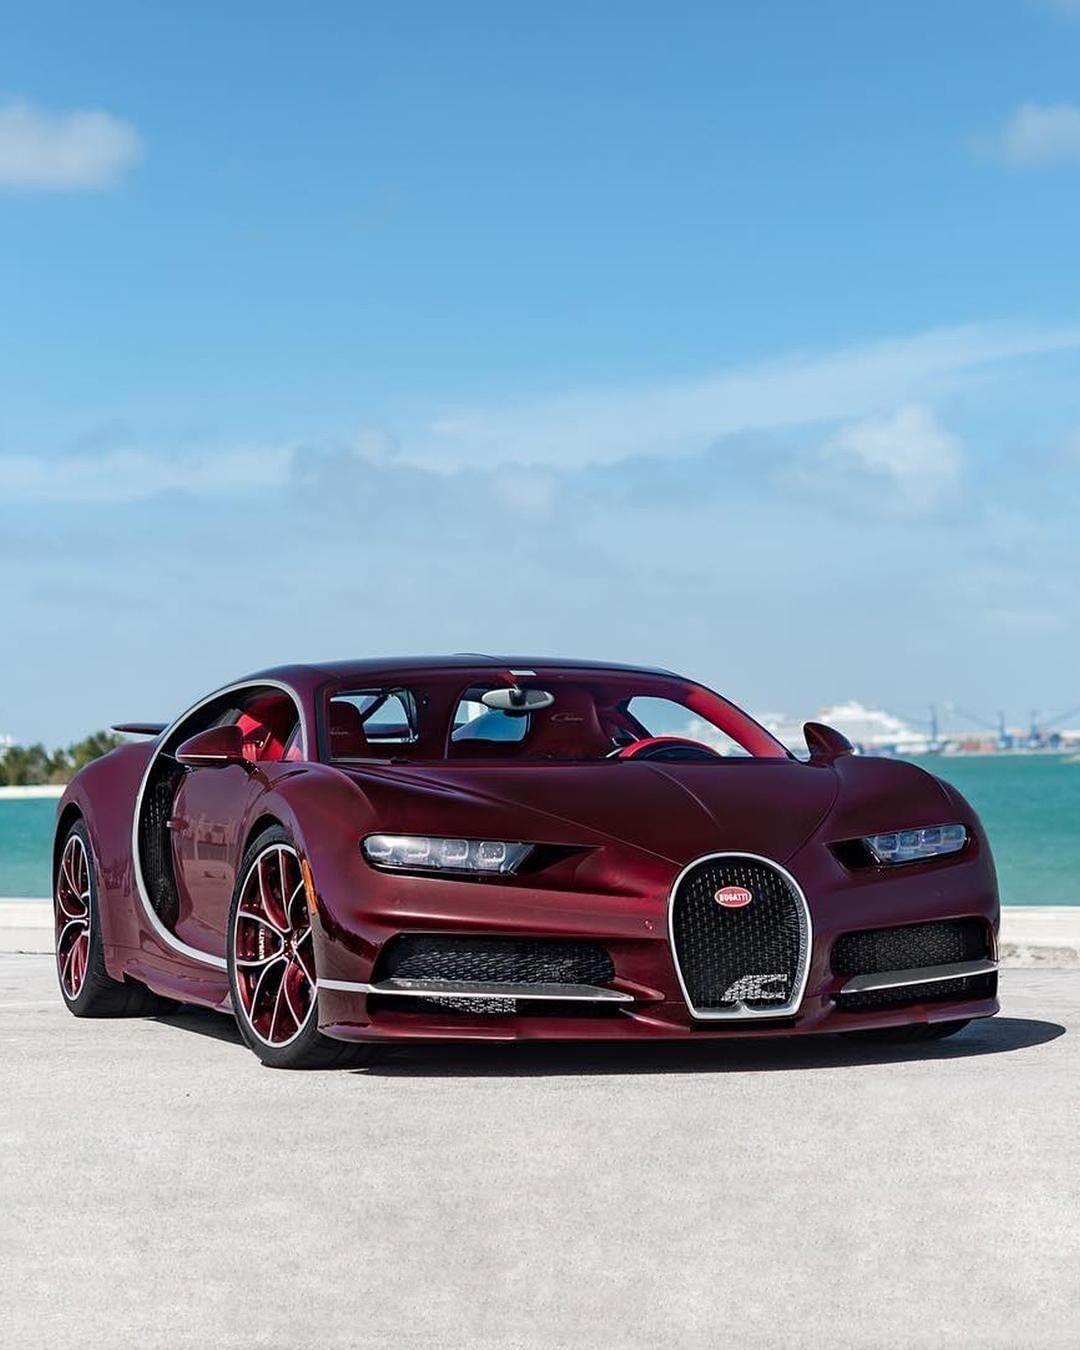 Pin By B On Super Cars In 2020 Best Luxury Cars Super Car Bugatti Luxury Cars